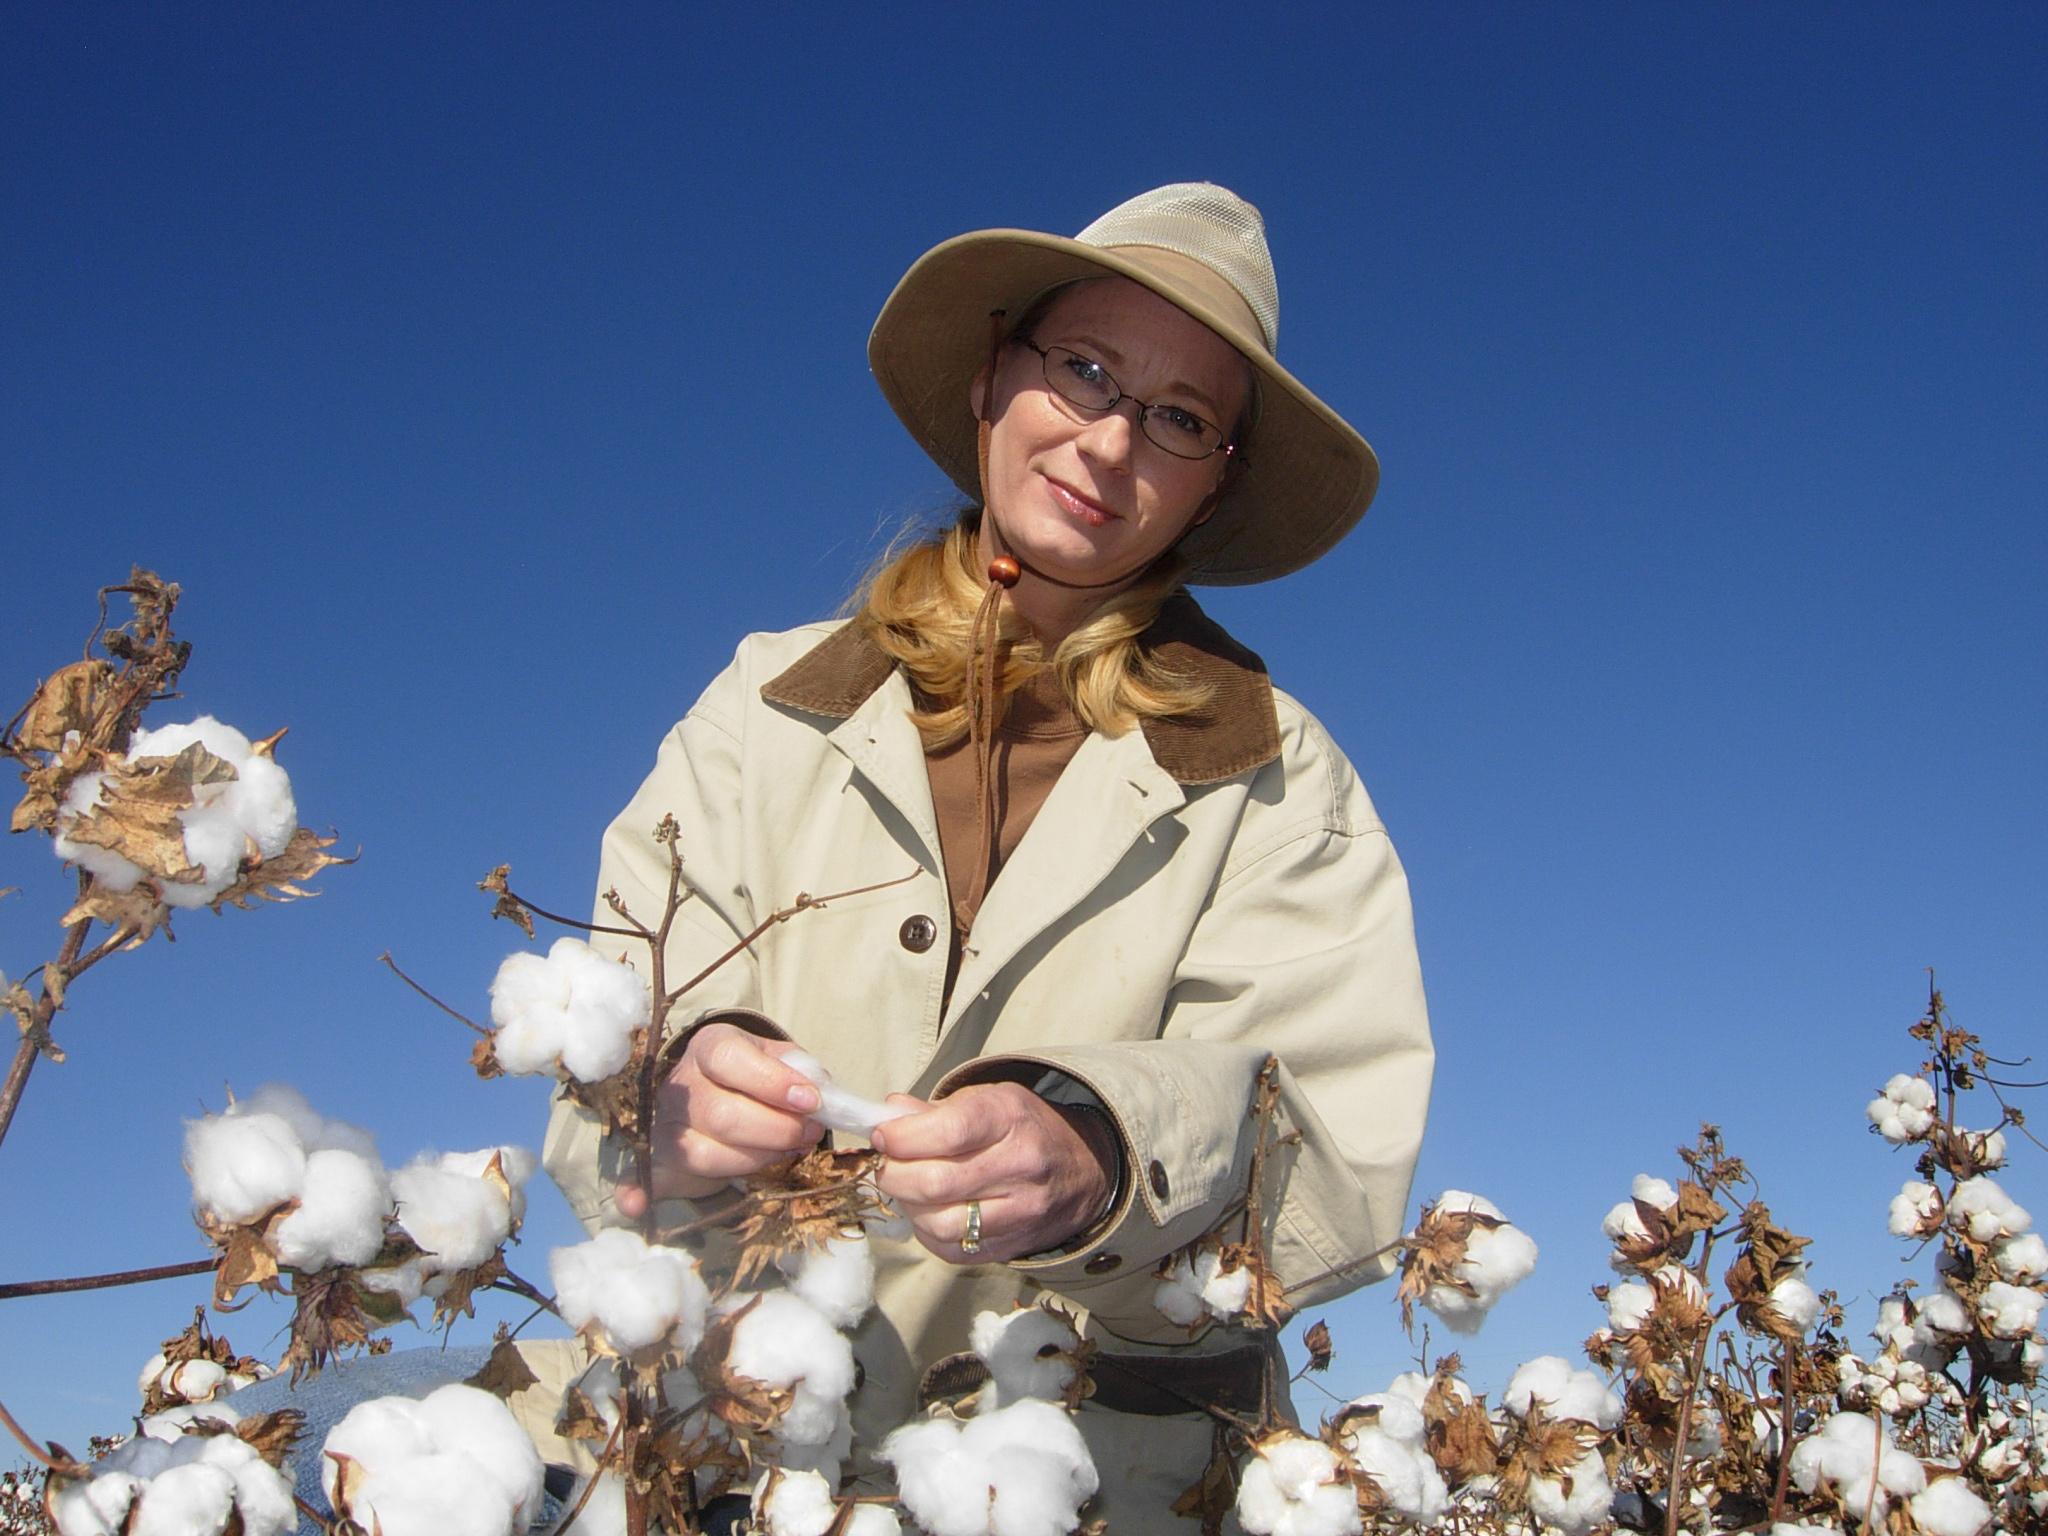 Jane Dever professor and cotton breeder